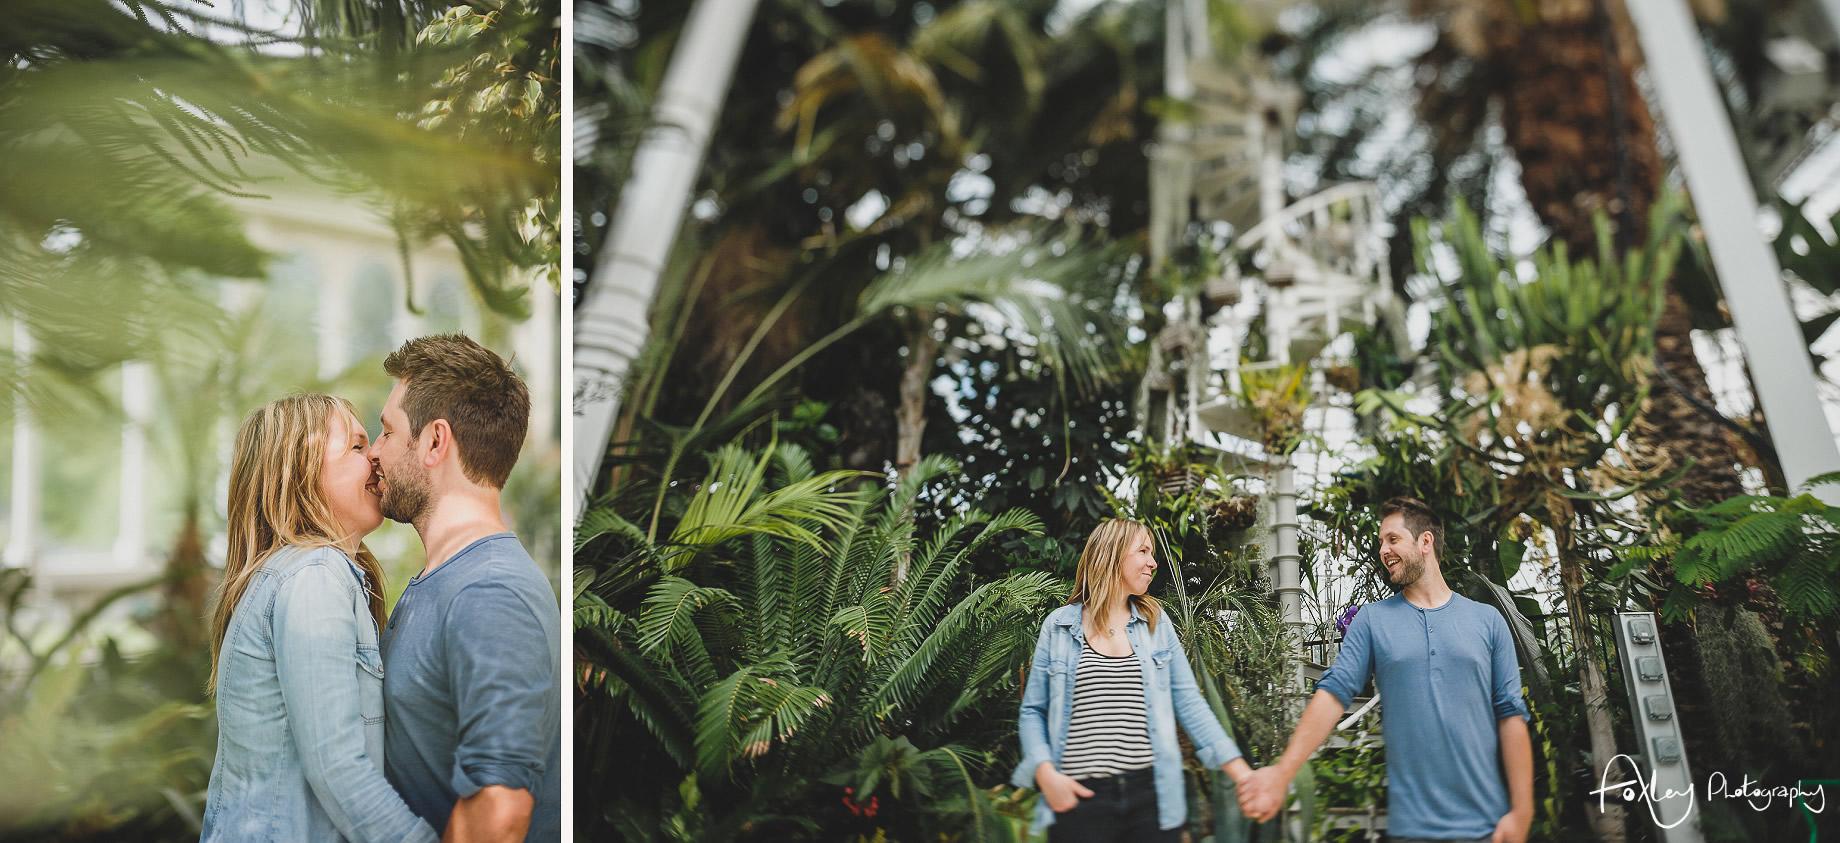 Lyndsey and Jon Pre-Wedding Shoot at Sefton Park 001